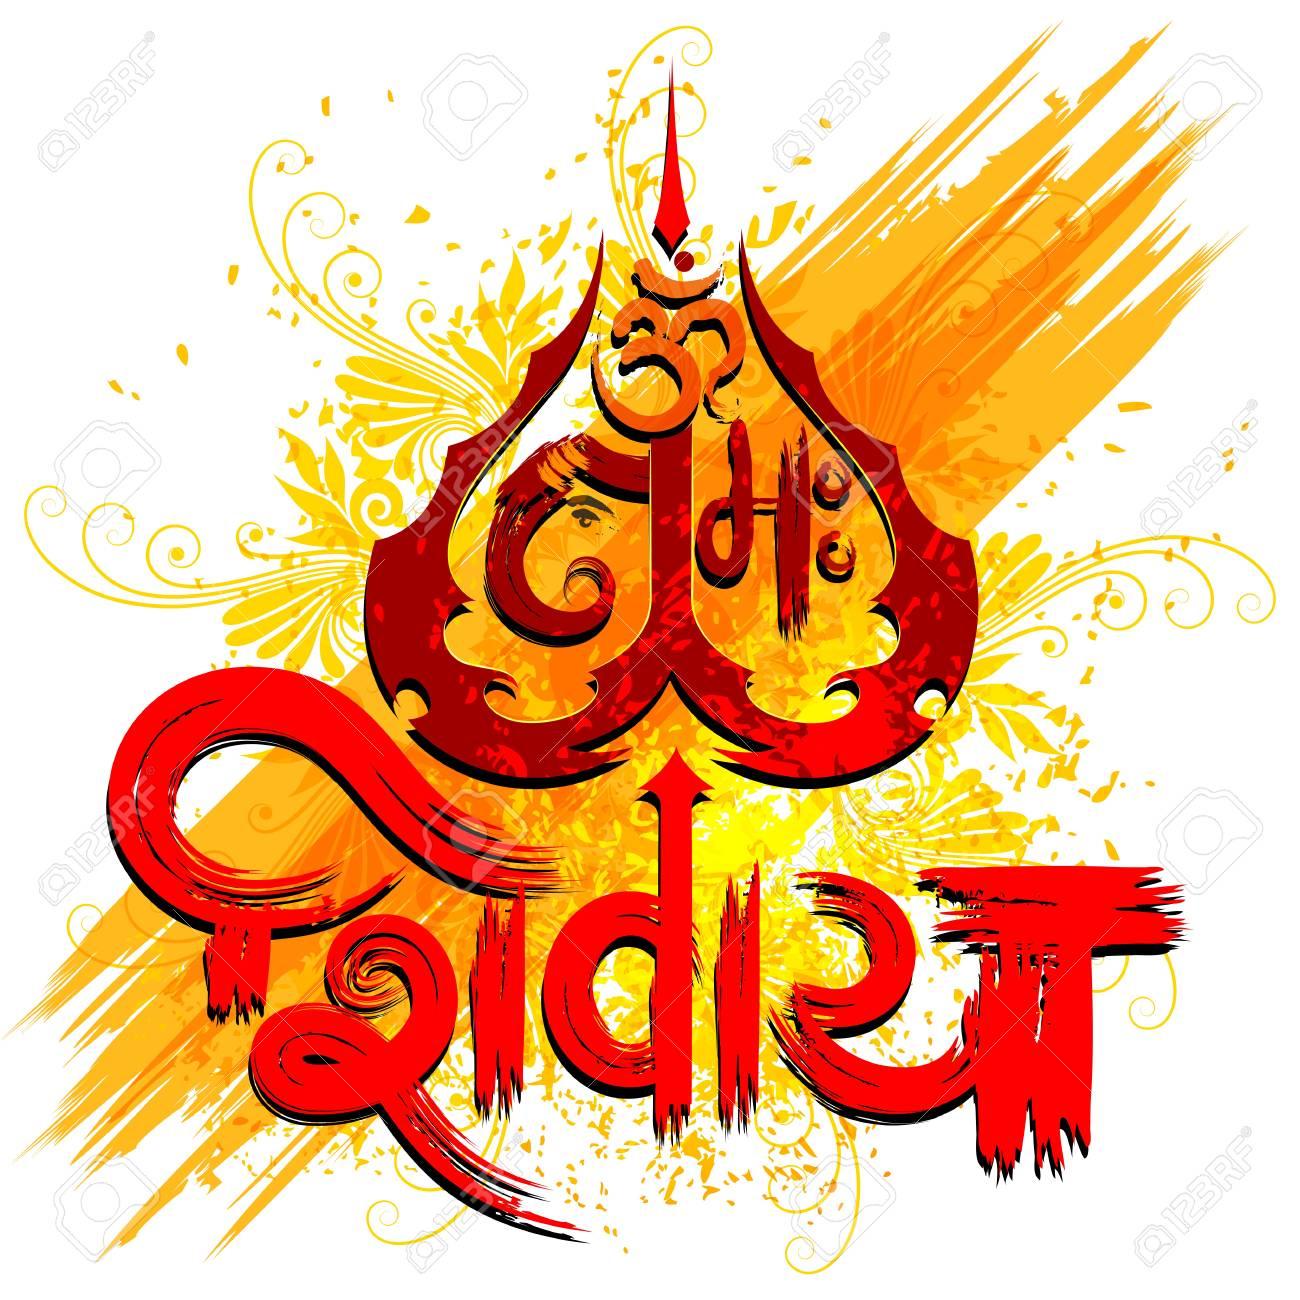 Creative Typo of Hindu God Lord Shiva's Mantra In Hindi